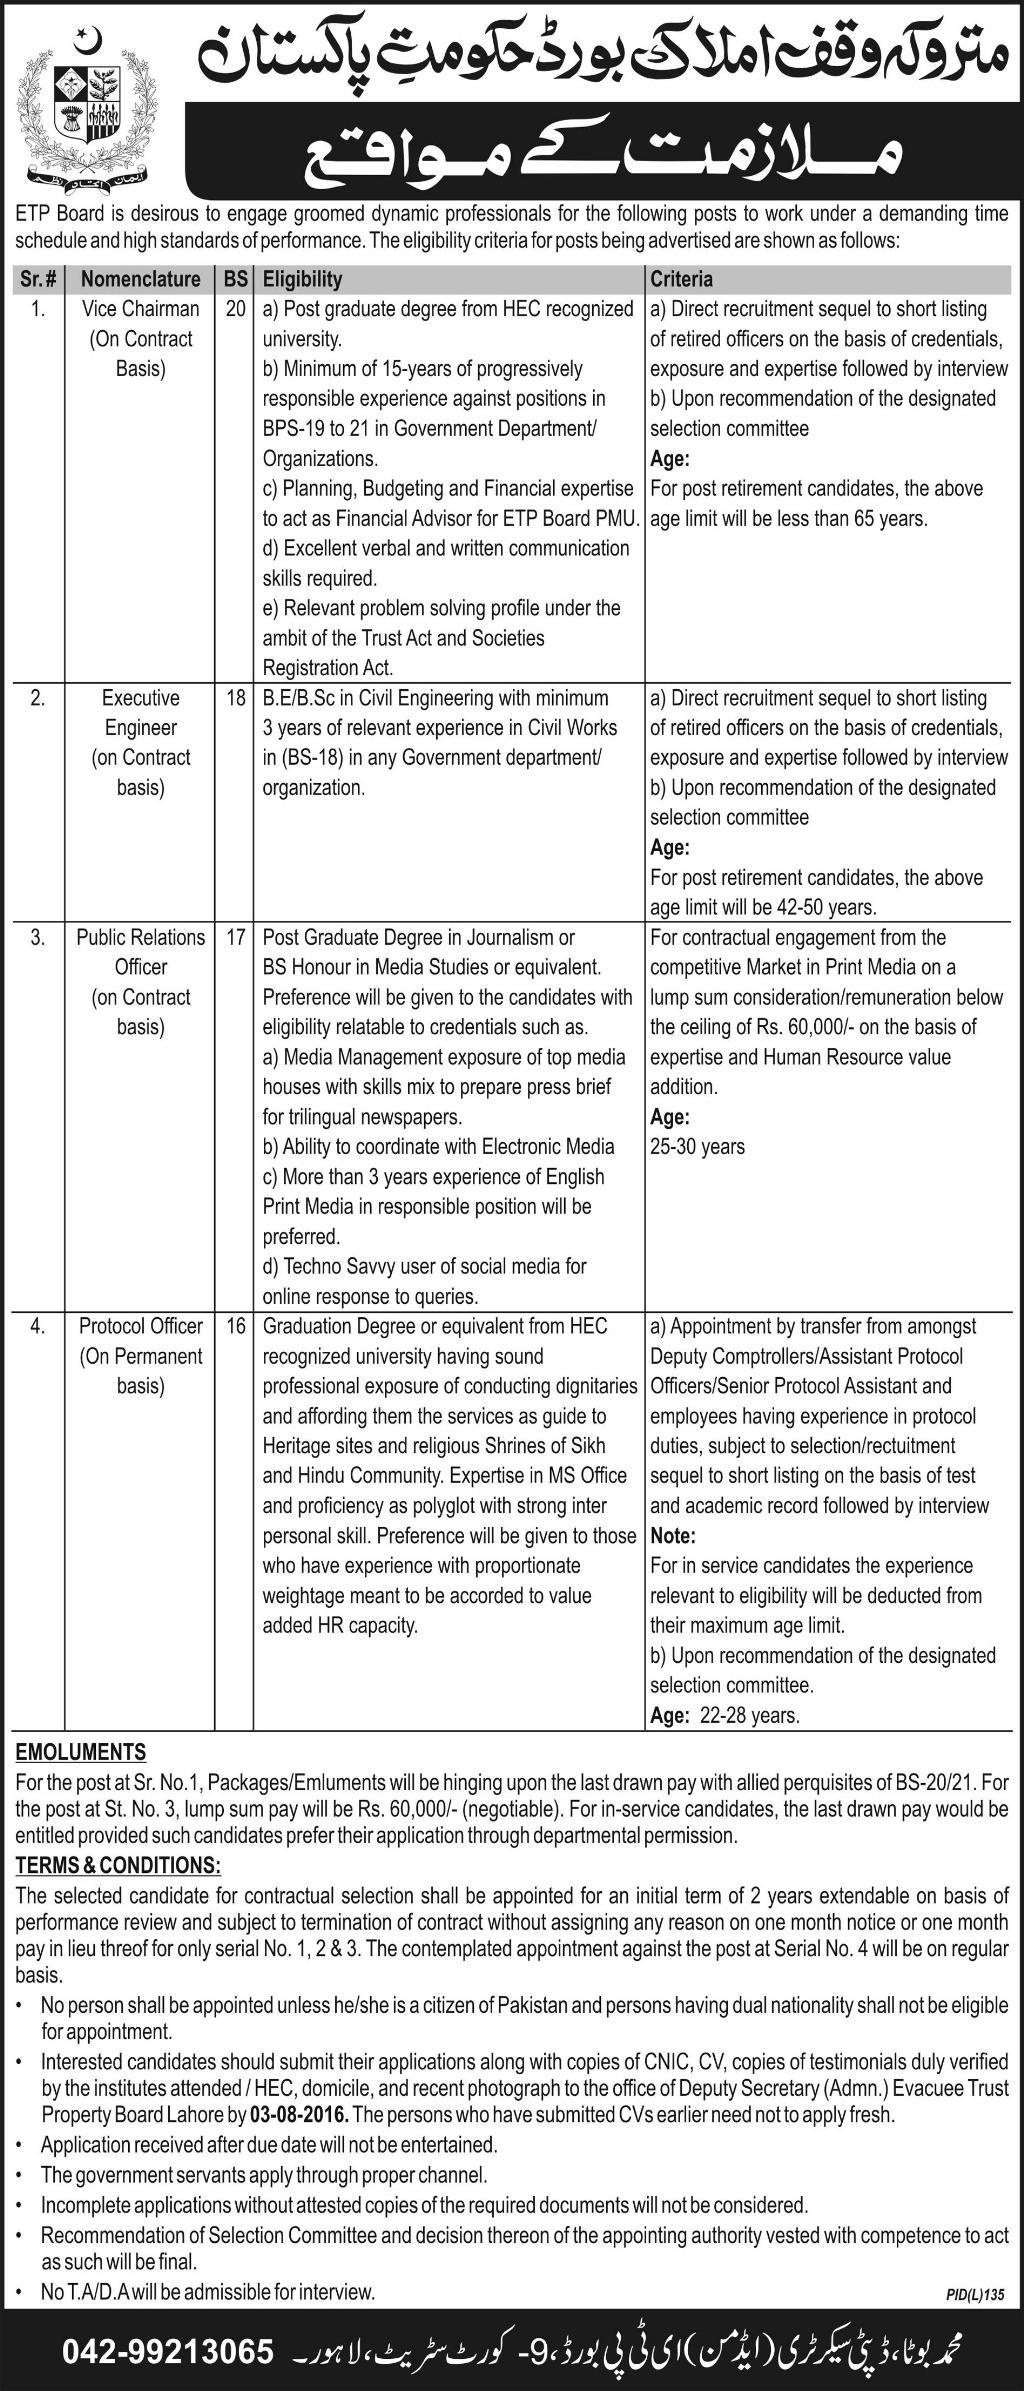 Matroka Waqf Imlak Board Career Opportunities